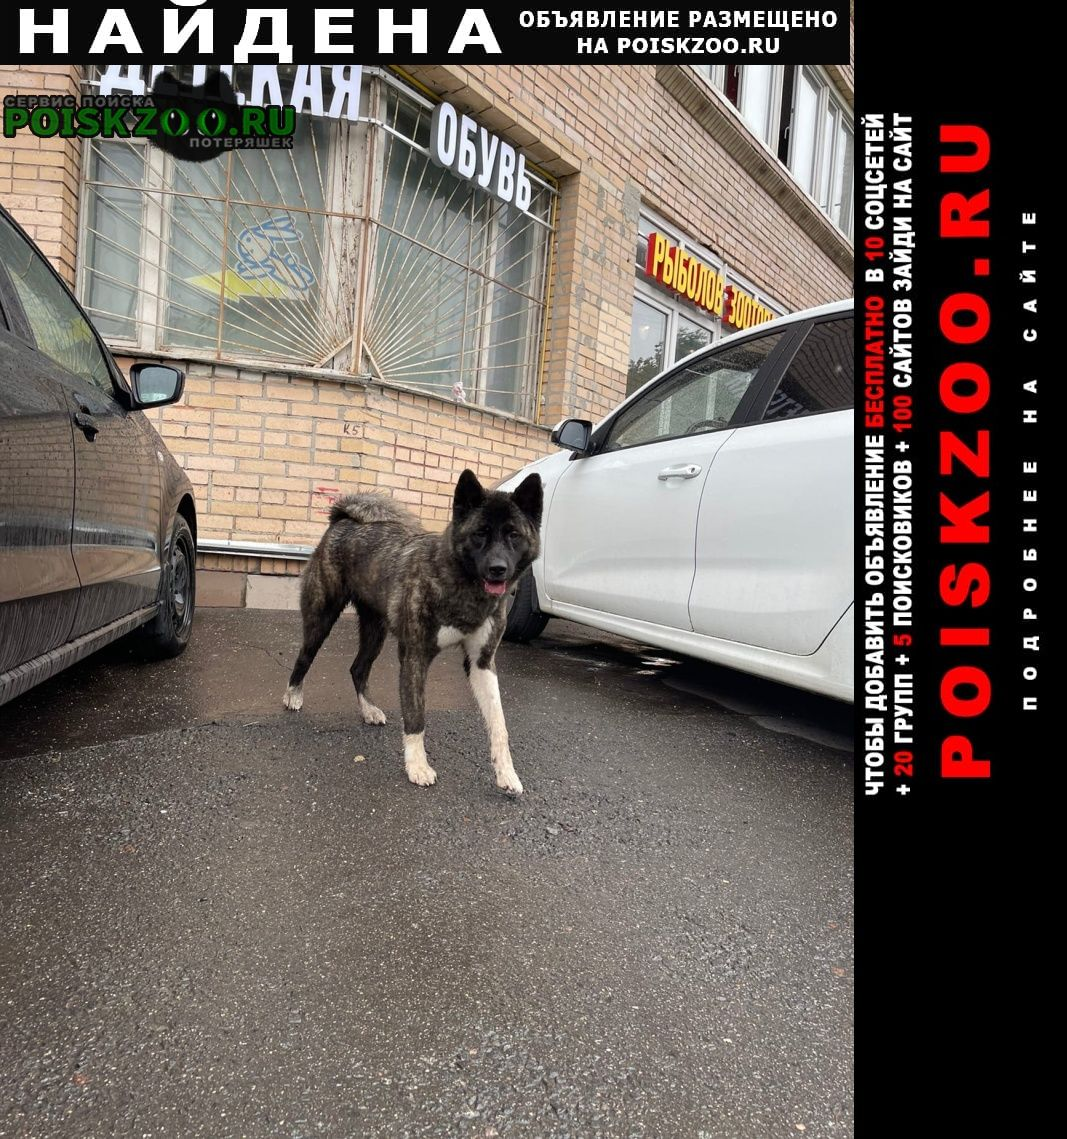 Найдена собака бескудниковский бульвар Москва